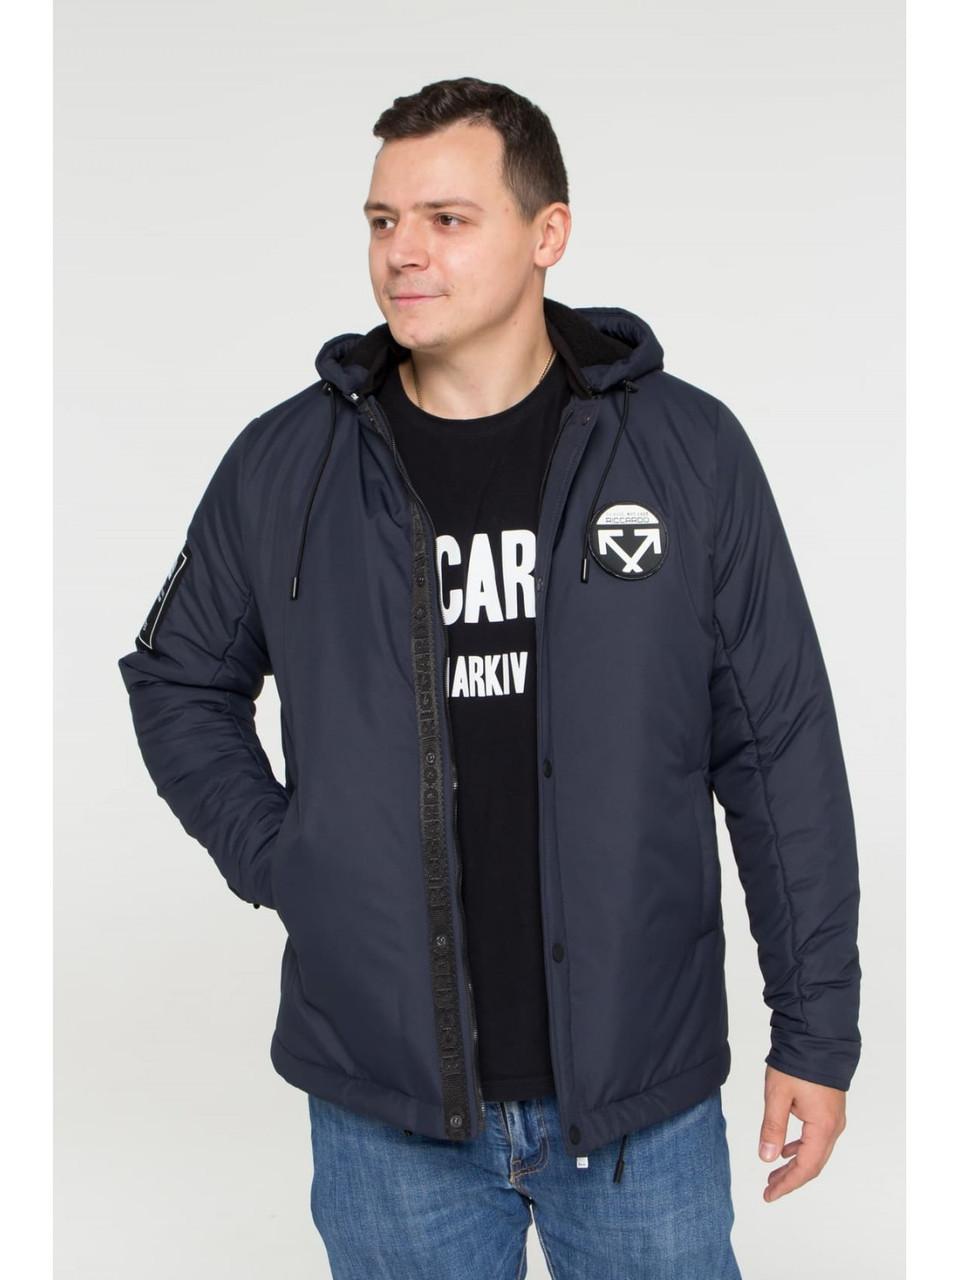 Мужская зимняя куртка бомбер Riccardo NY Синий 46